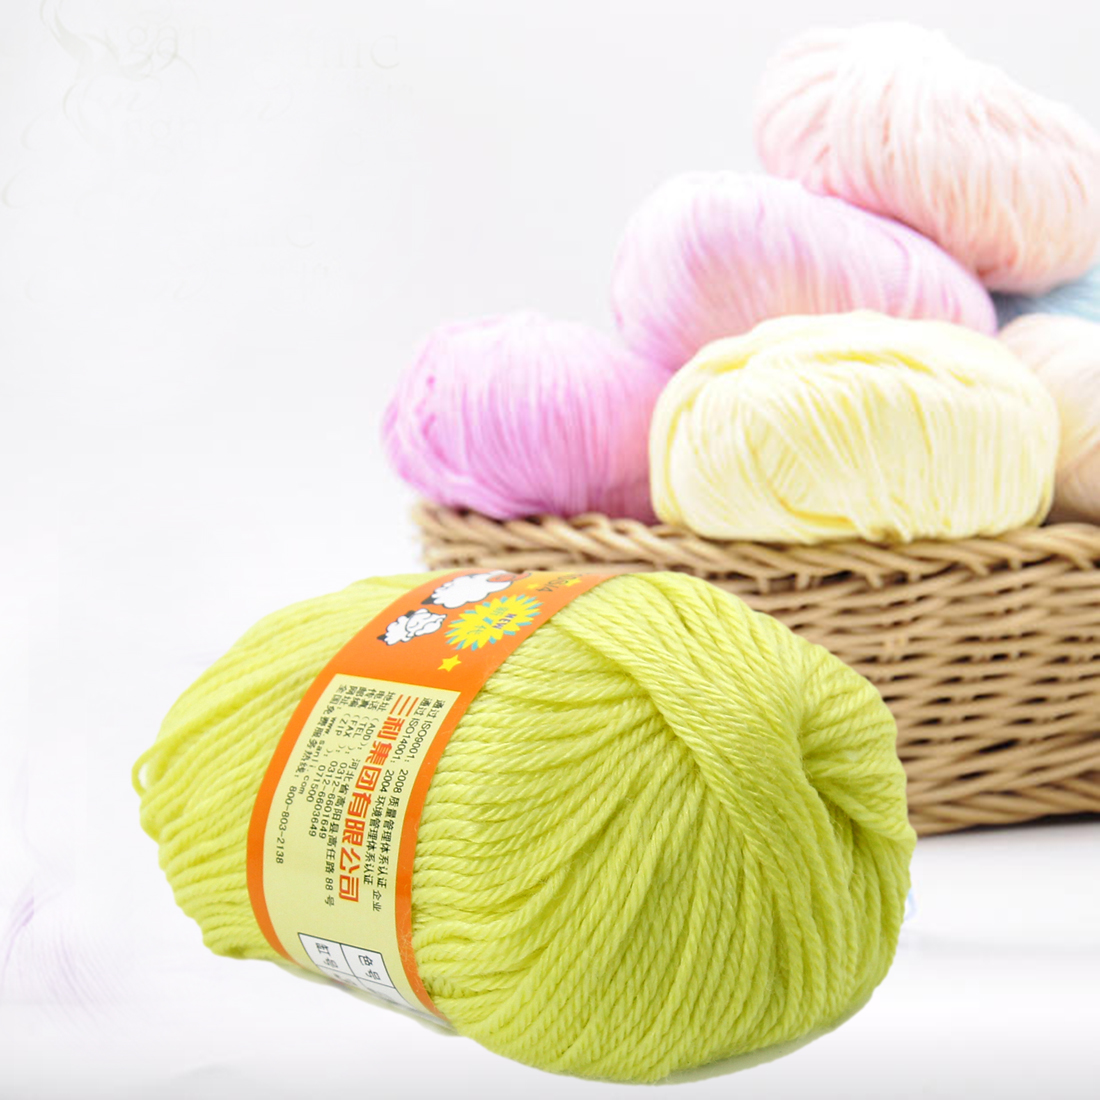 New 1pc 50g Cotton Knitting Yarn Crochet Yarn For Knitting